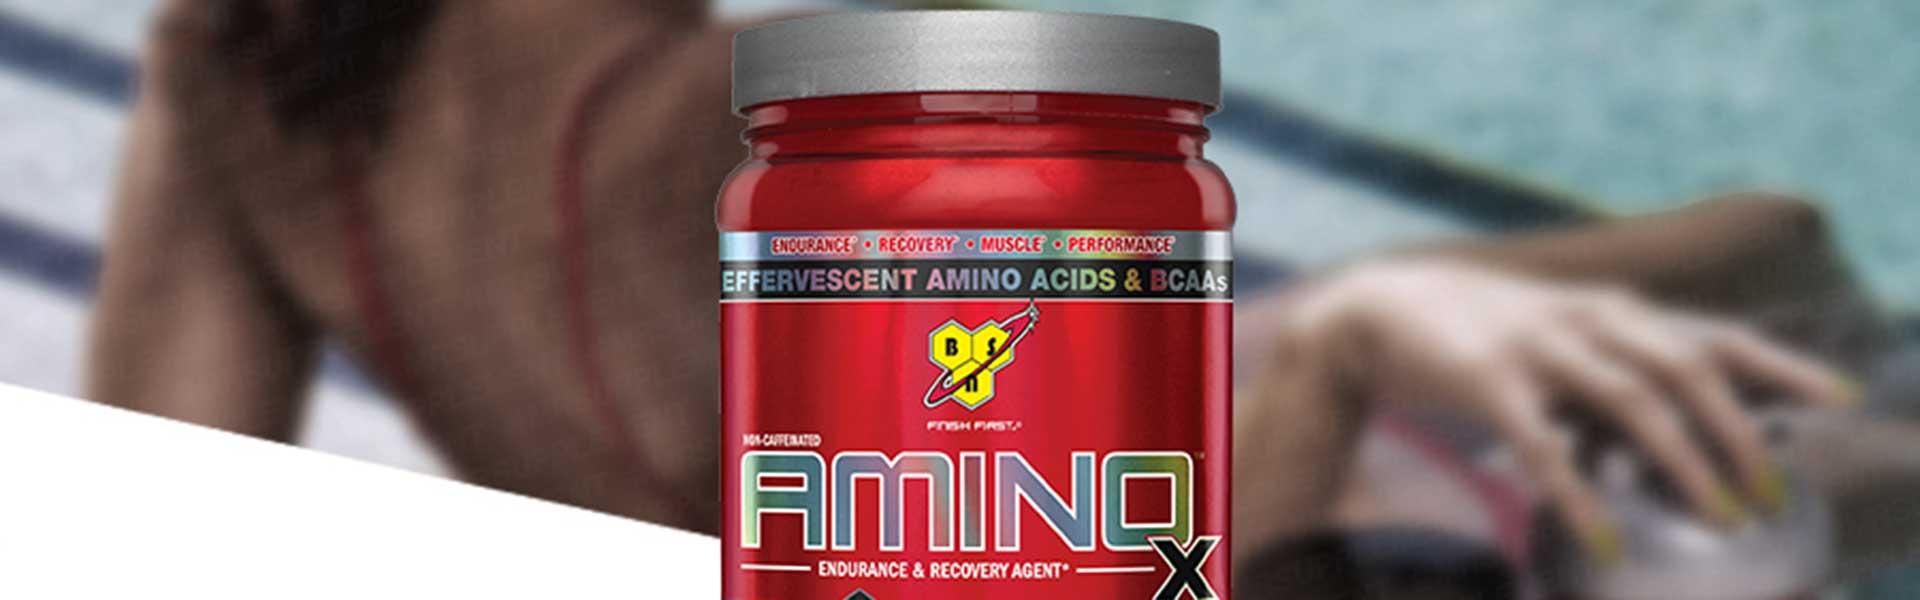 BSN-Amino-X-on-DigitalDistributionHub